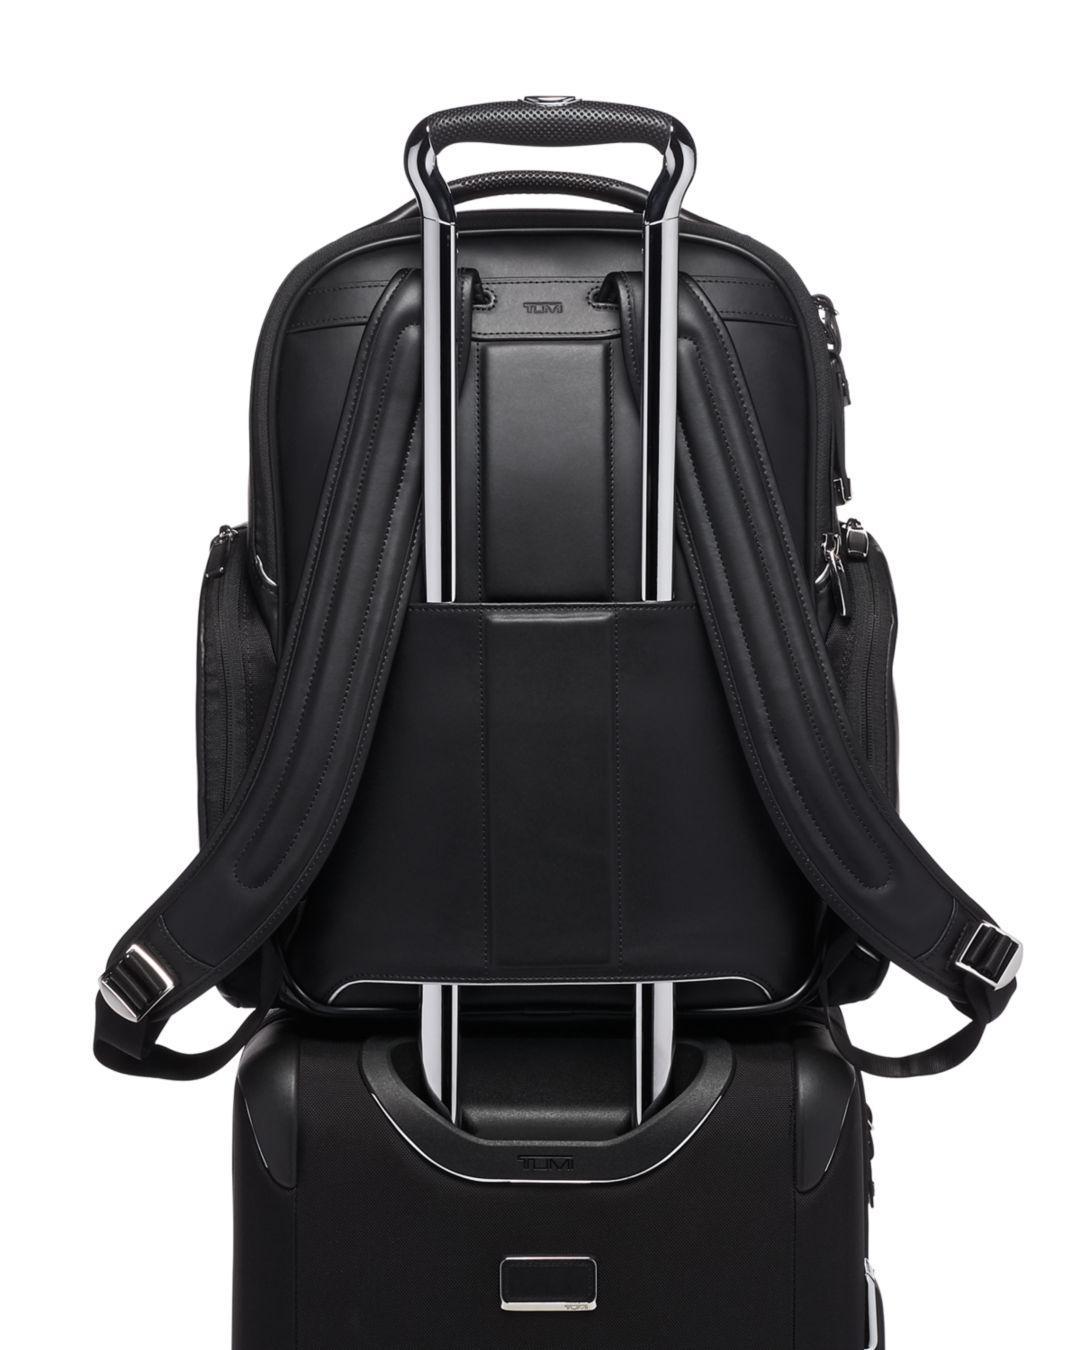 f636b5e53590 Lyst - Tumi Arrivé Barker Backpack in Black for Men - Save 5%